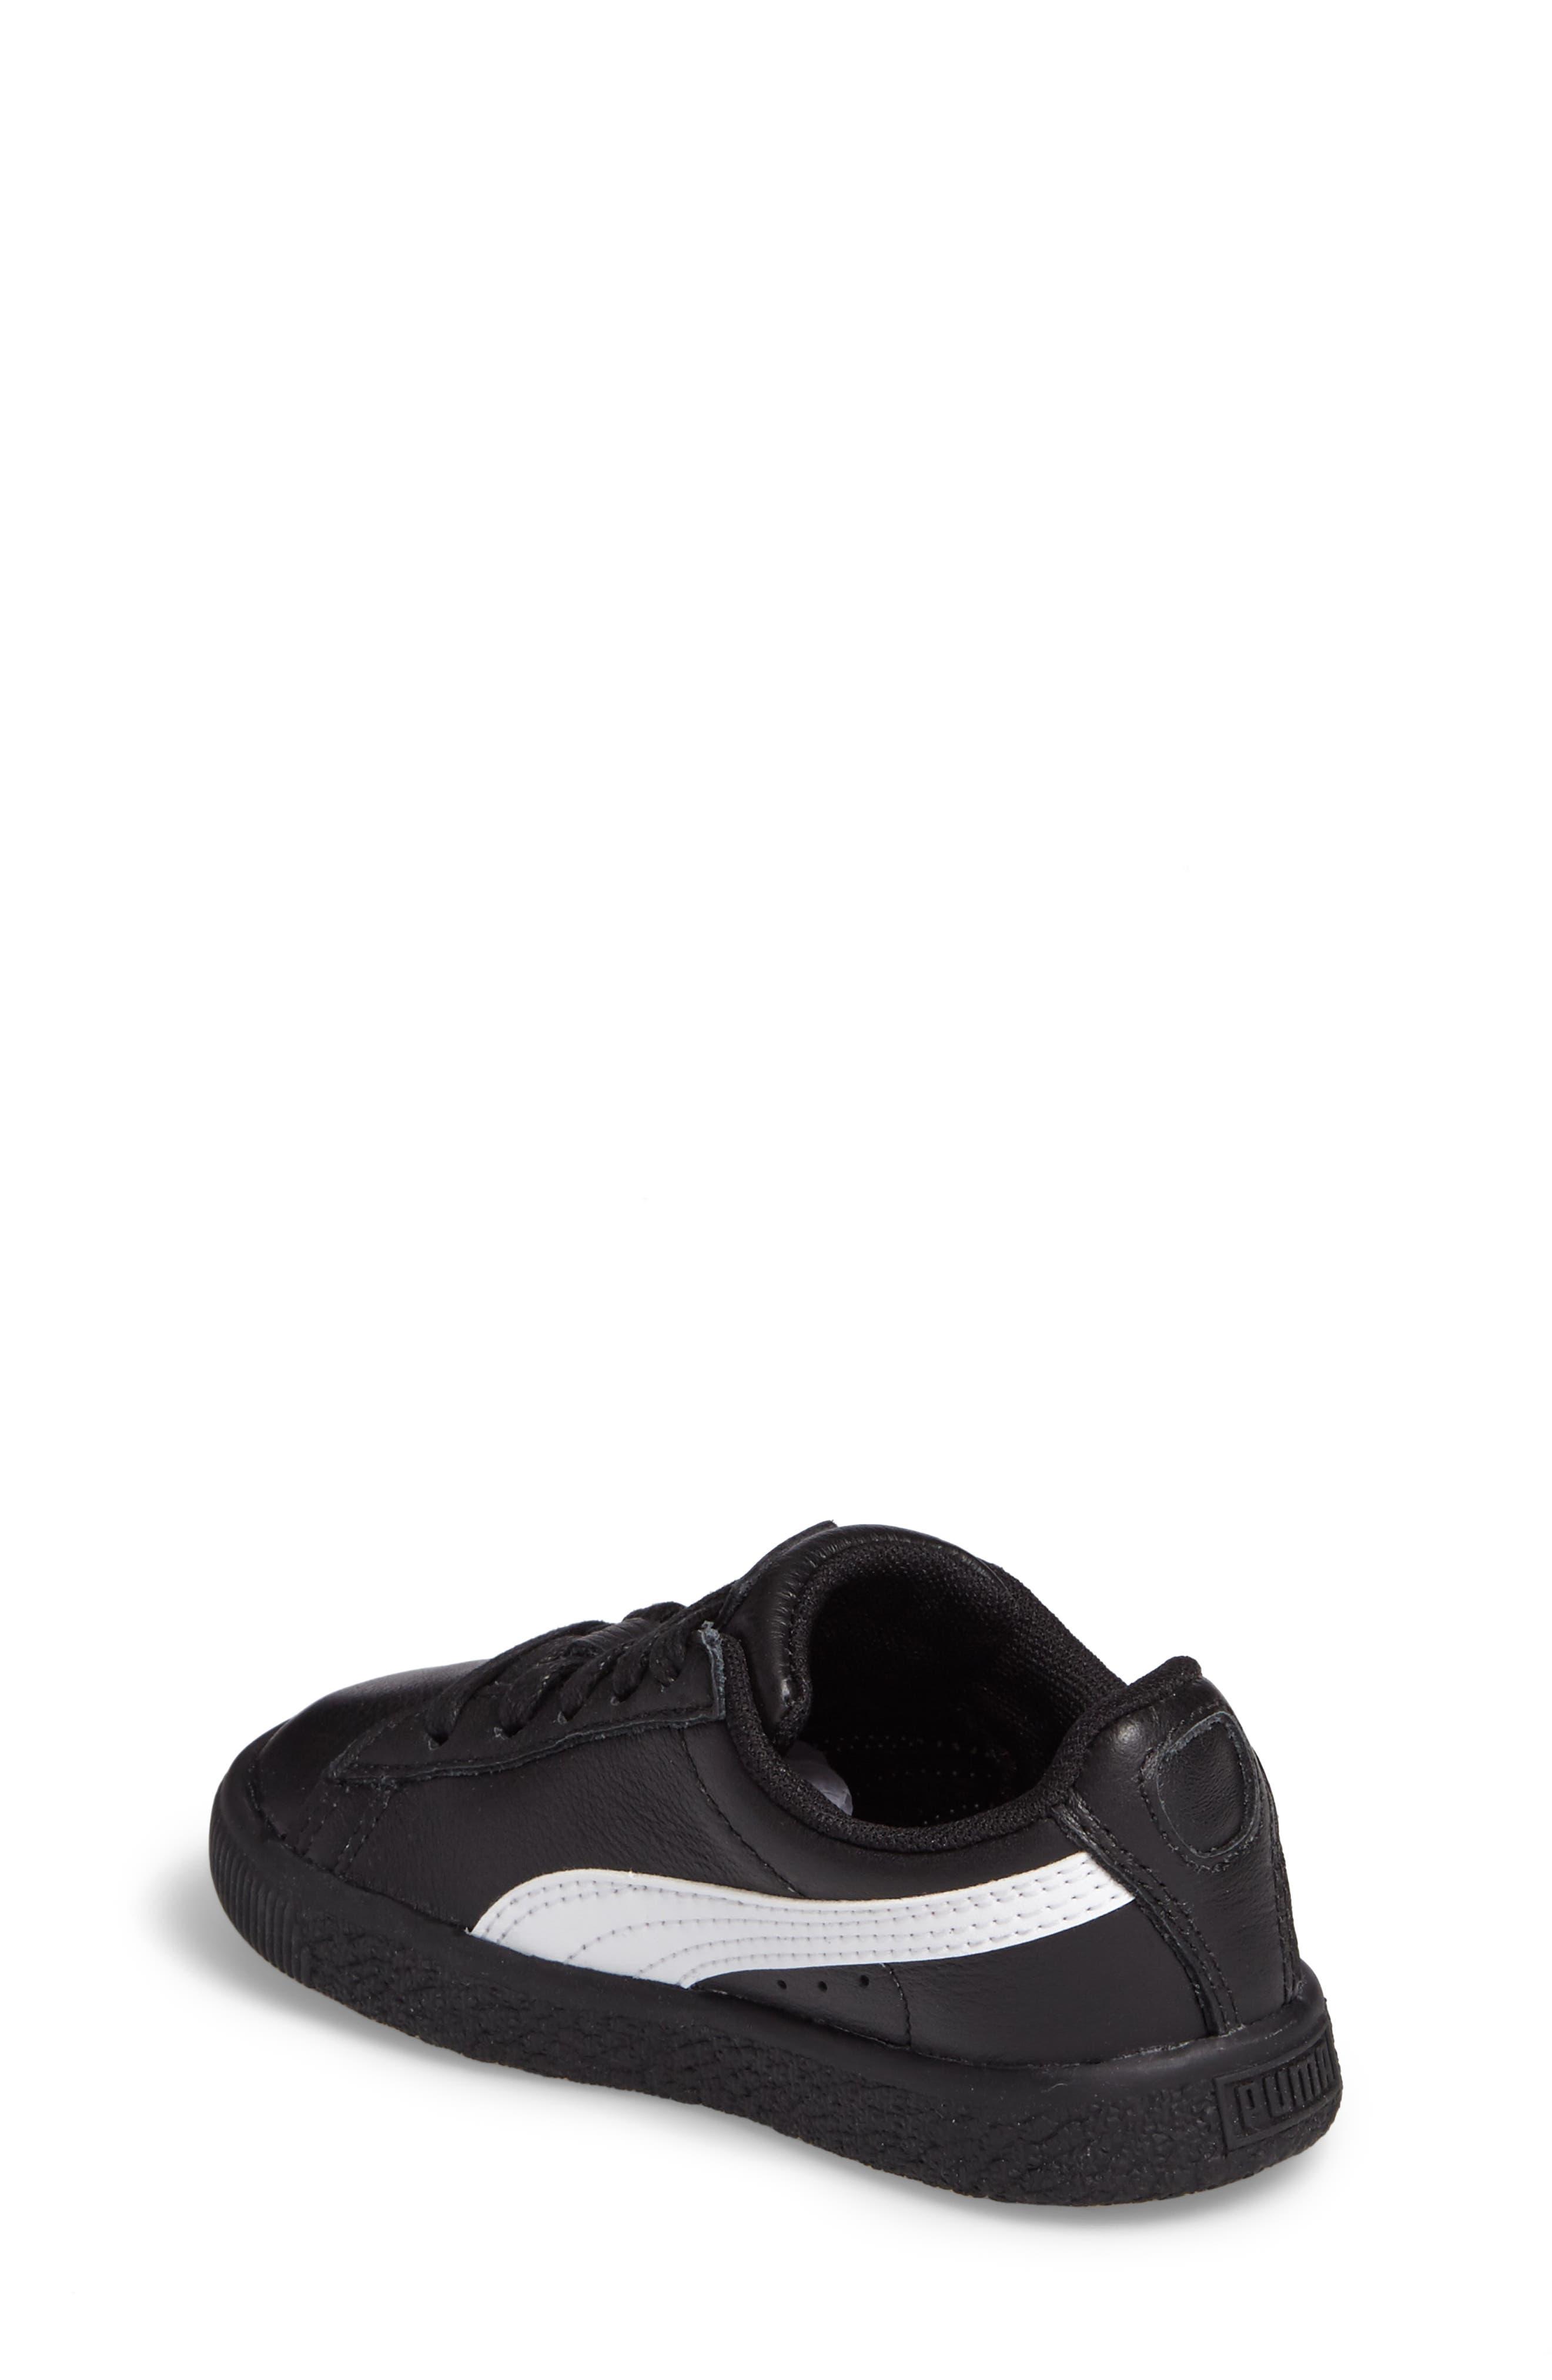 Alternate Image 2  - PUMA Clyde Core Foil Sneaker (Baby, Walker & Toddler)